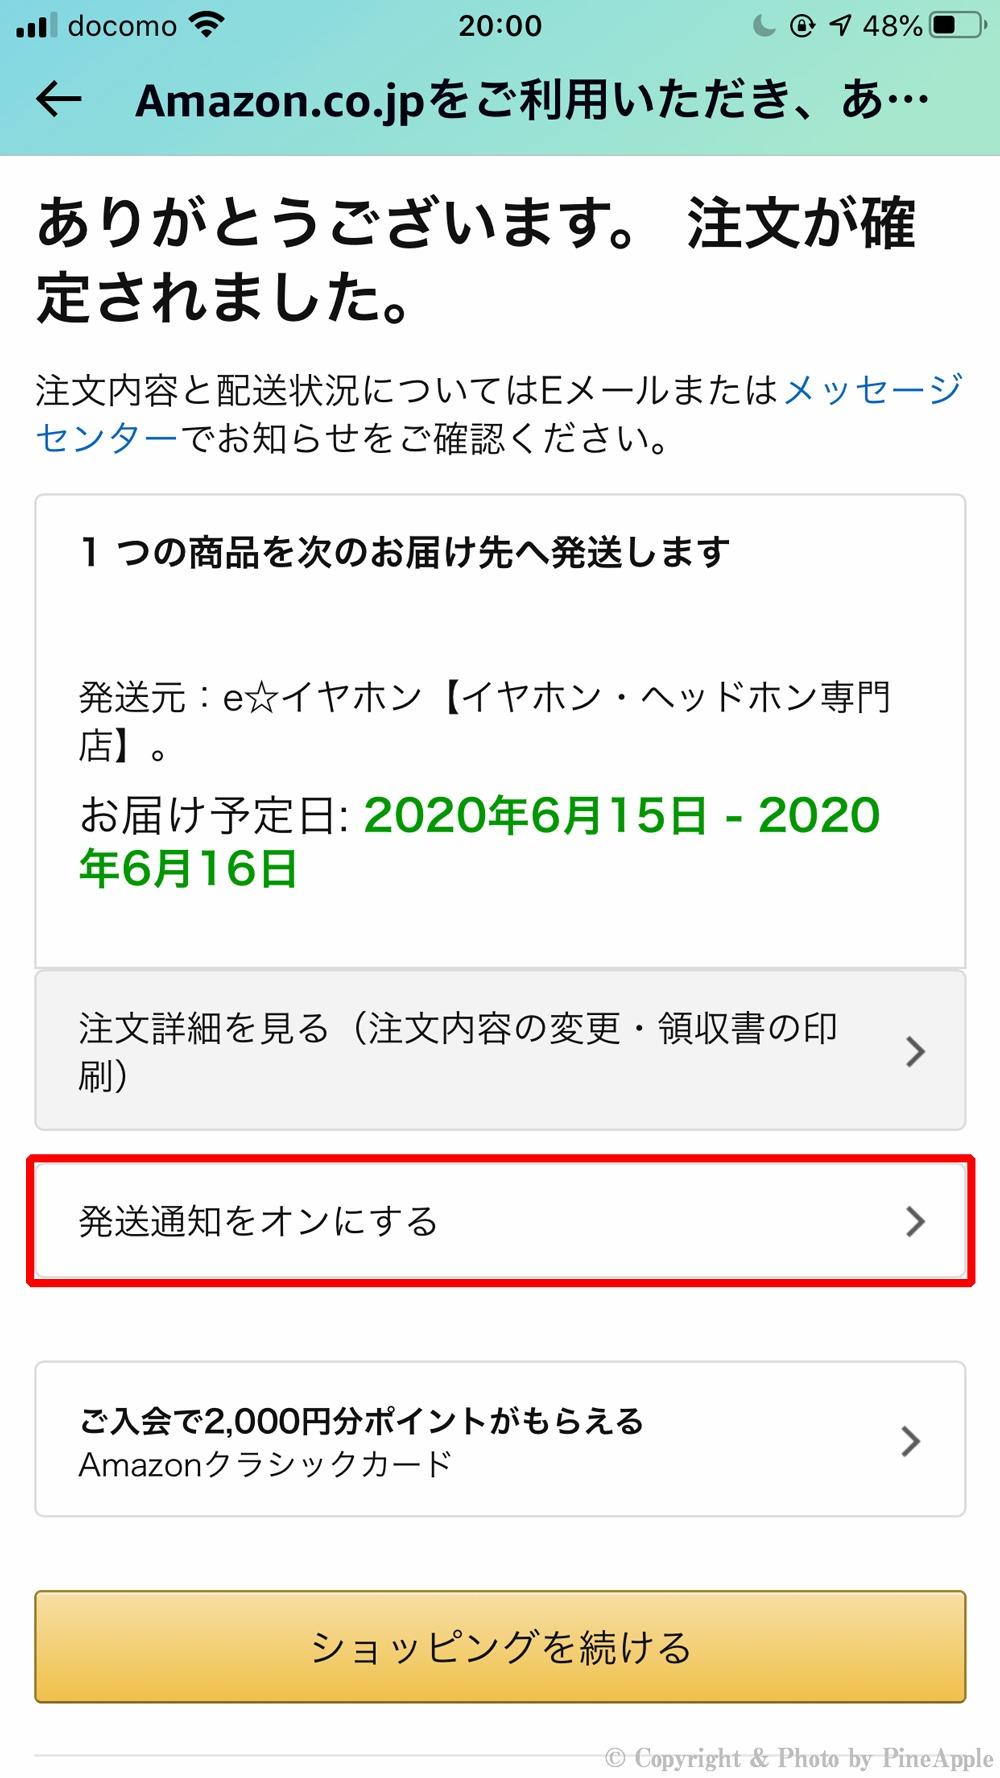 Amazon ショッピングアプリ:「注文確定画面」が表示され、発送通知を希望する場合は、「発送通知をオンにする」をタップ